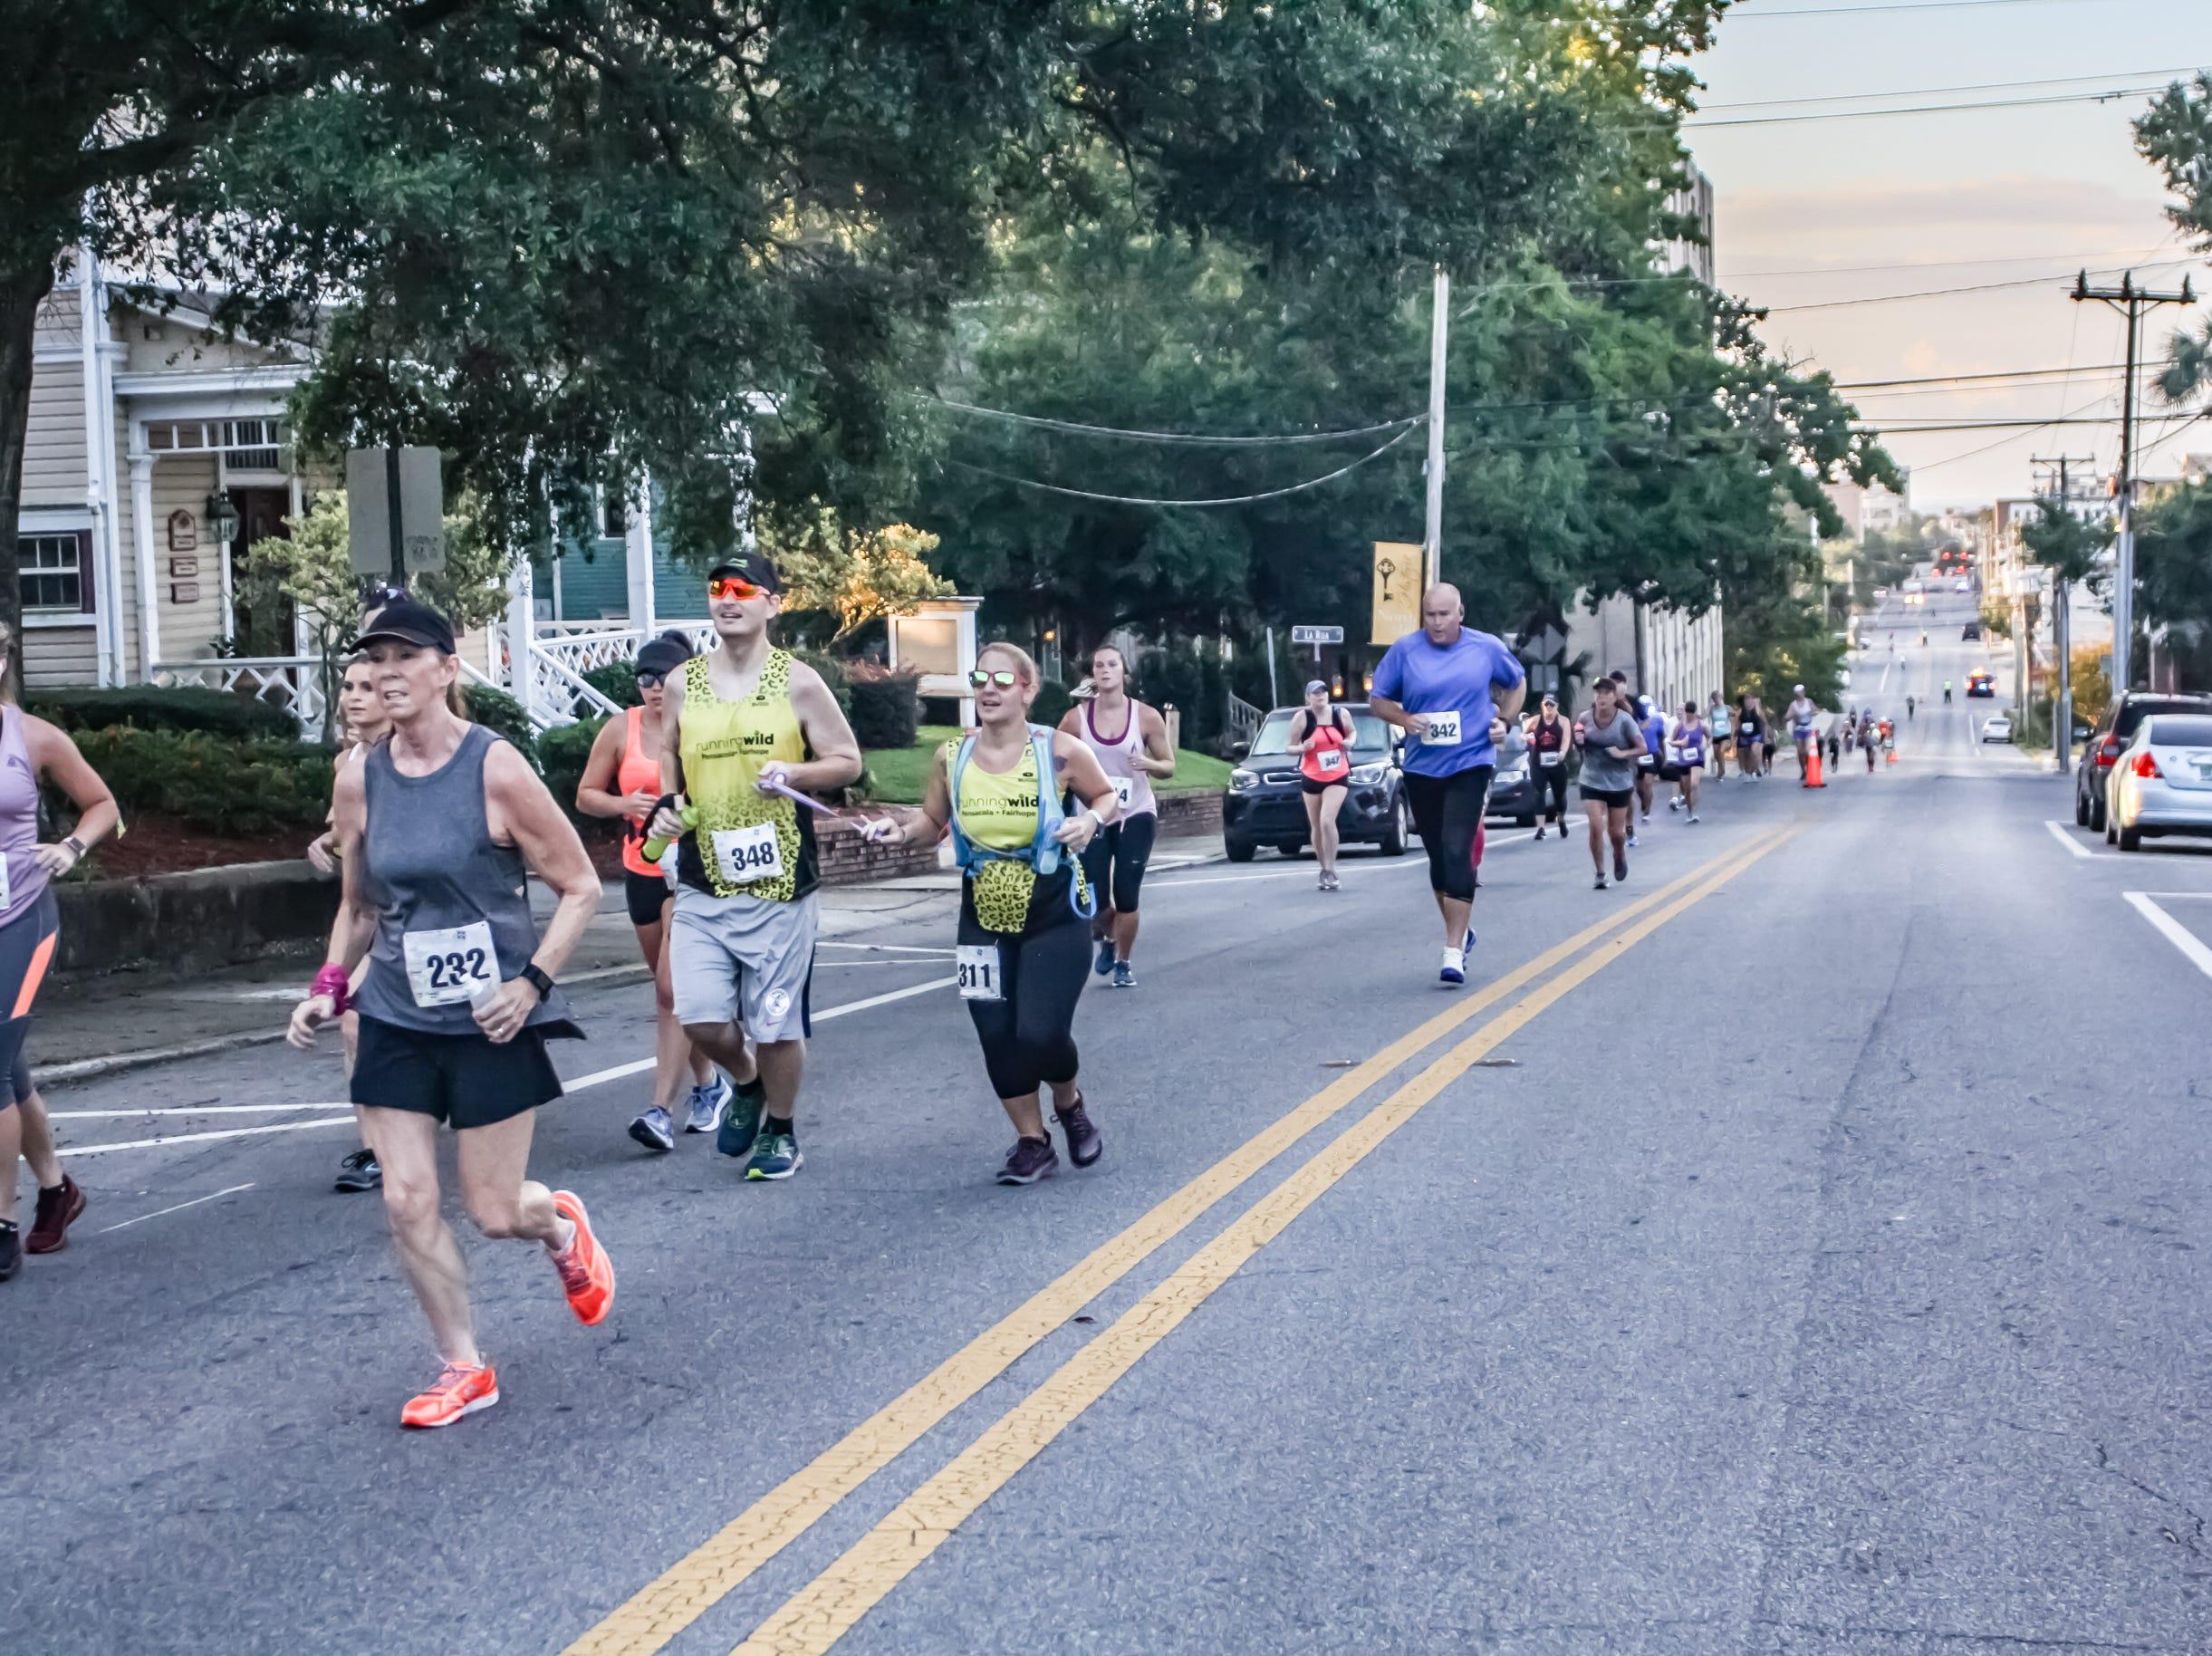 Runners test their mettle at the Pensacola Half Marathon on Oct. 7, 2018.